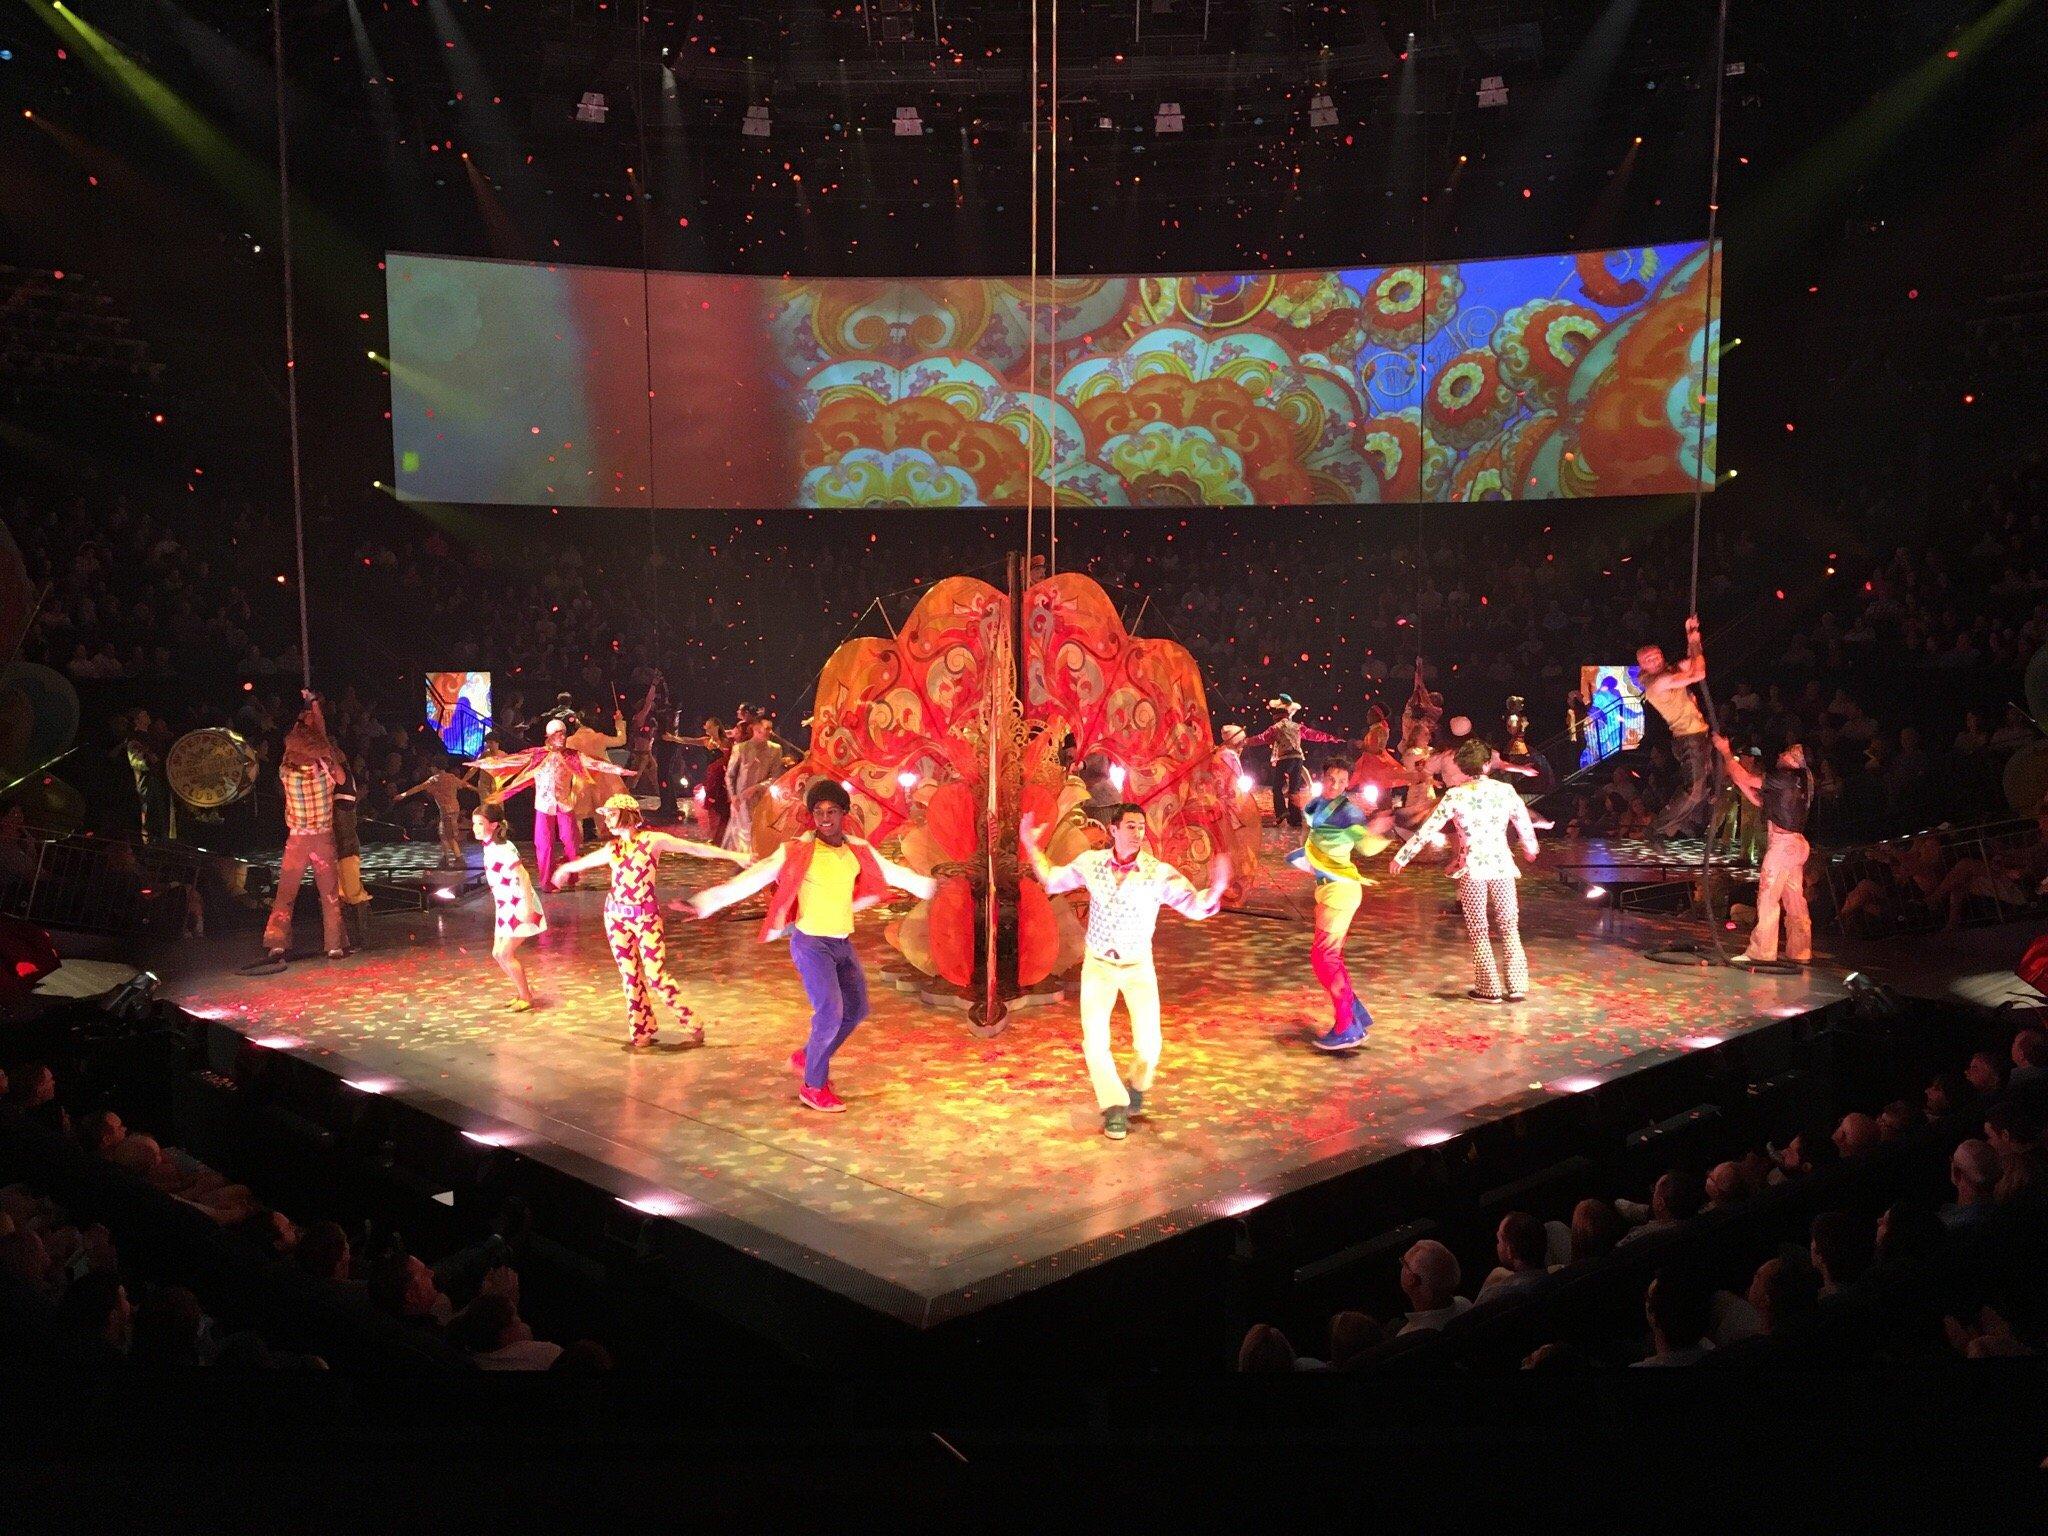 The Beatles - Love - Cirque du Soleil